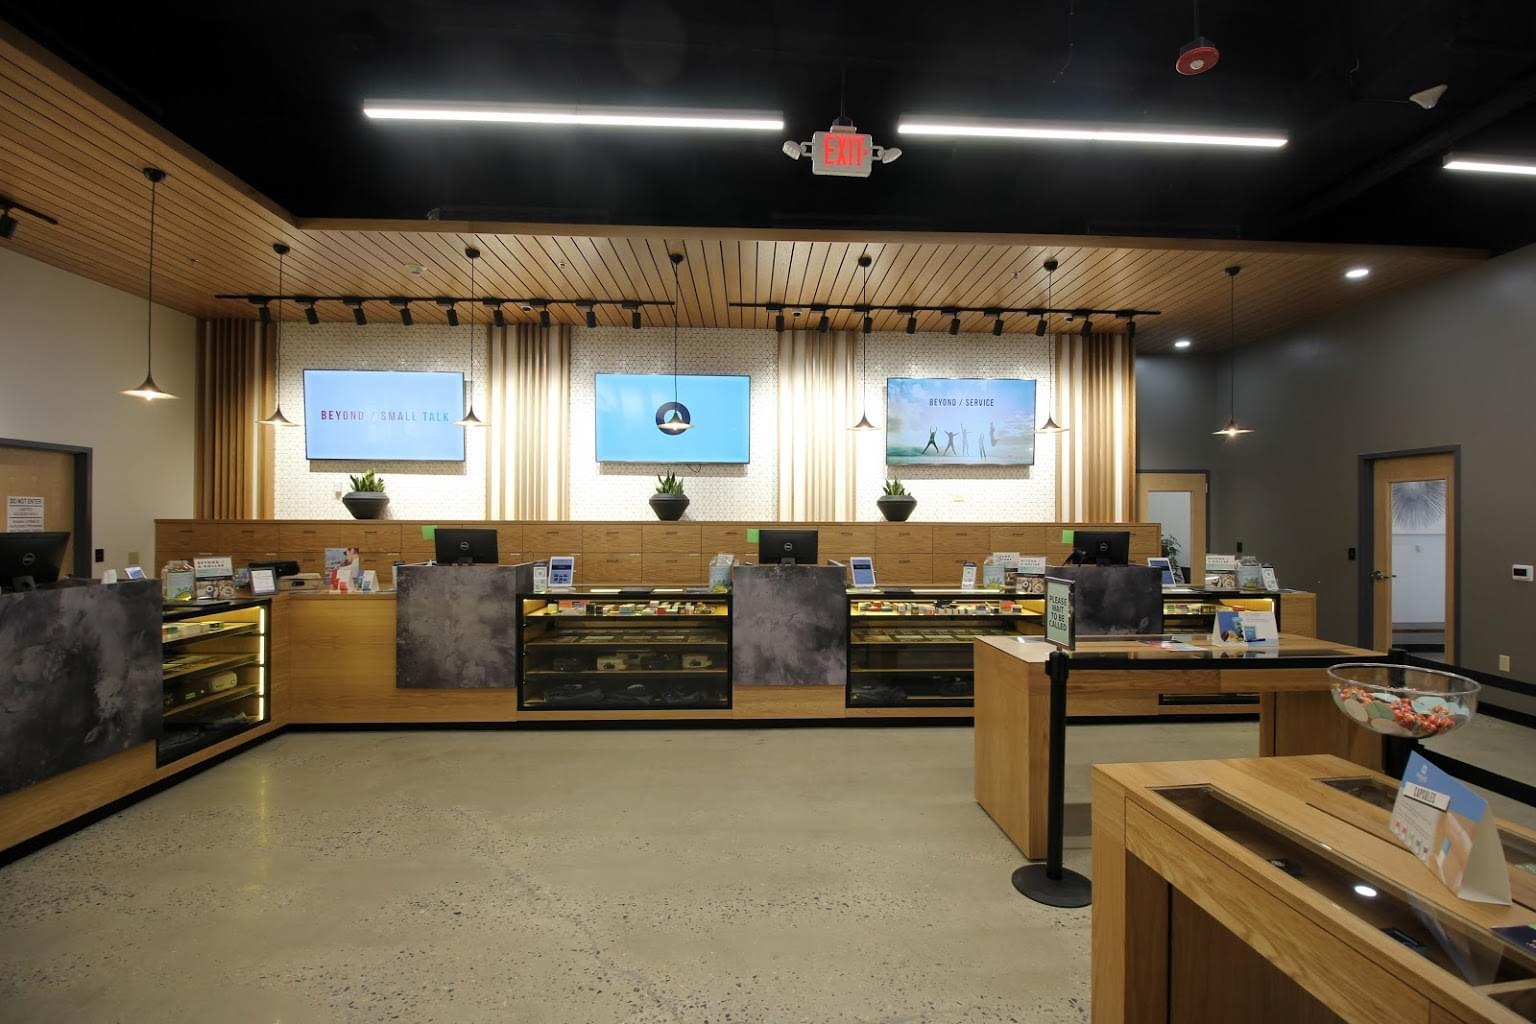 BEYOND / HELLO medical marijuana dispensary in Philadelphia, PA